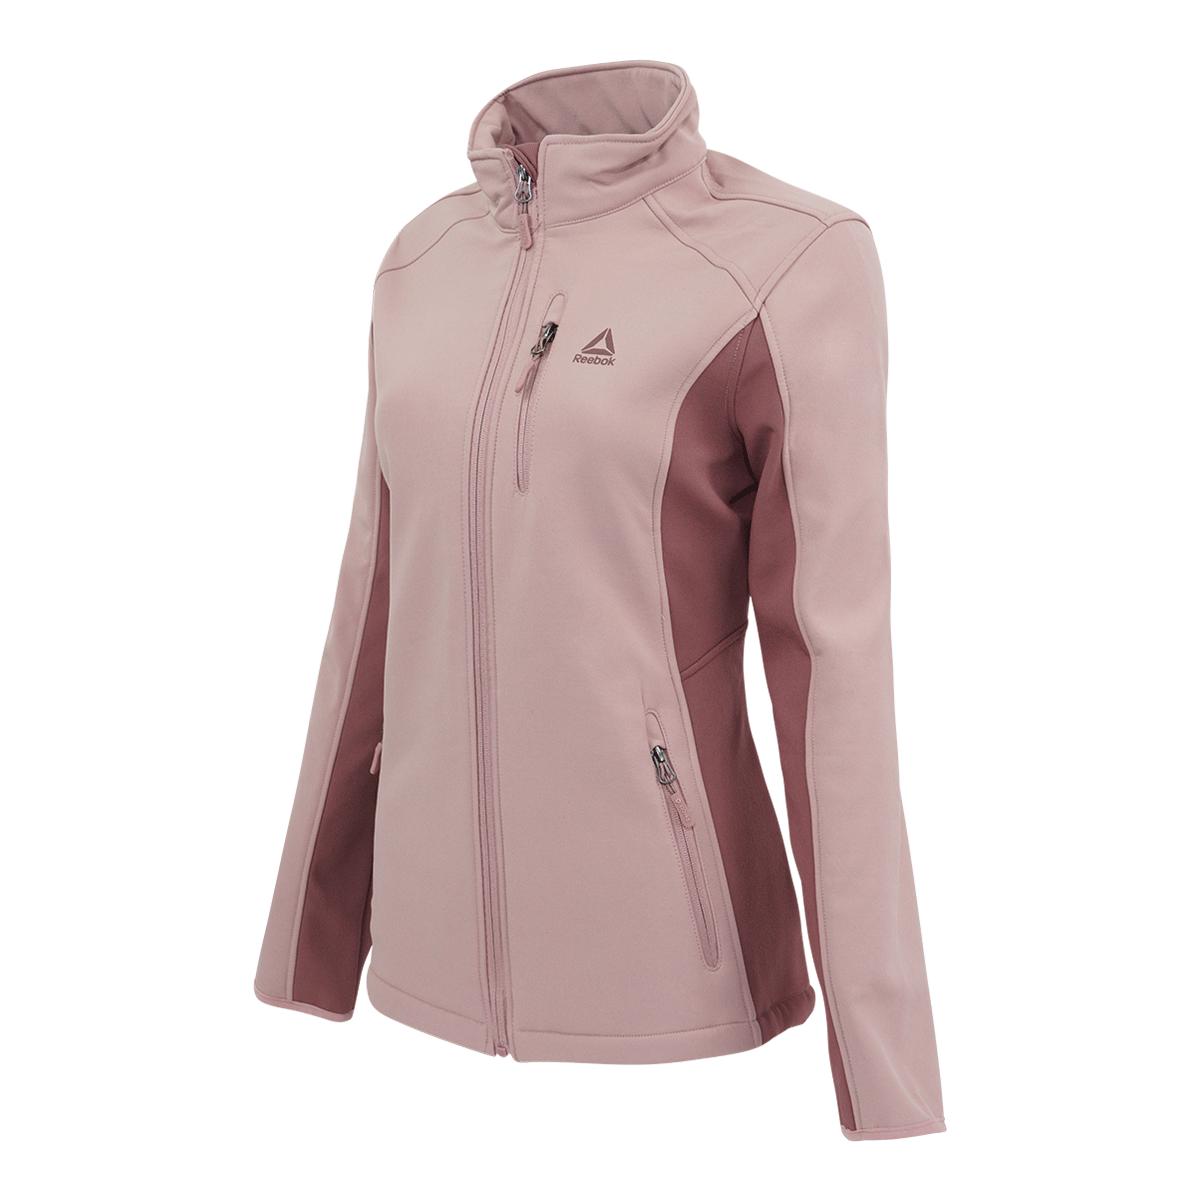 Reebok-Women-039-s-Full-Zip-Softshell-Jacket thumbnail 16